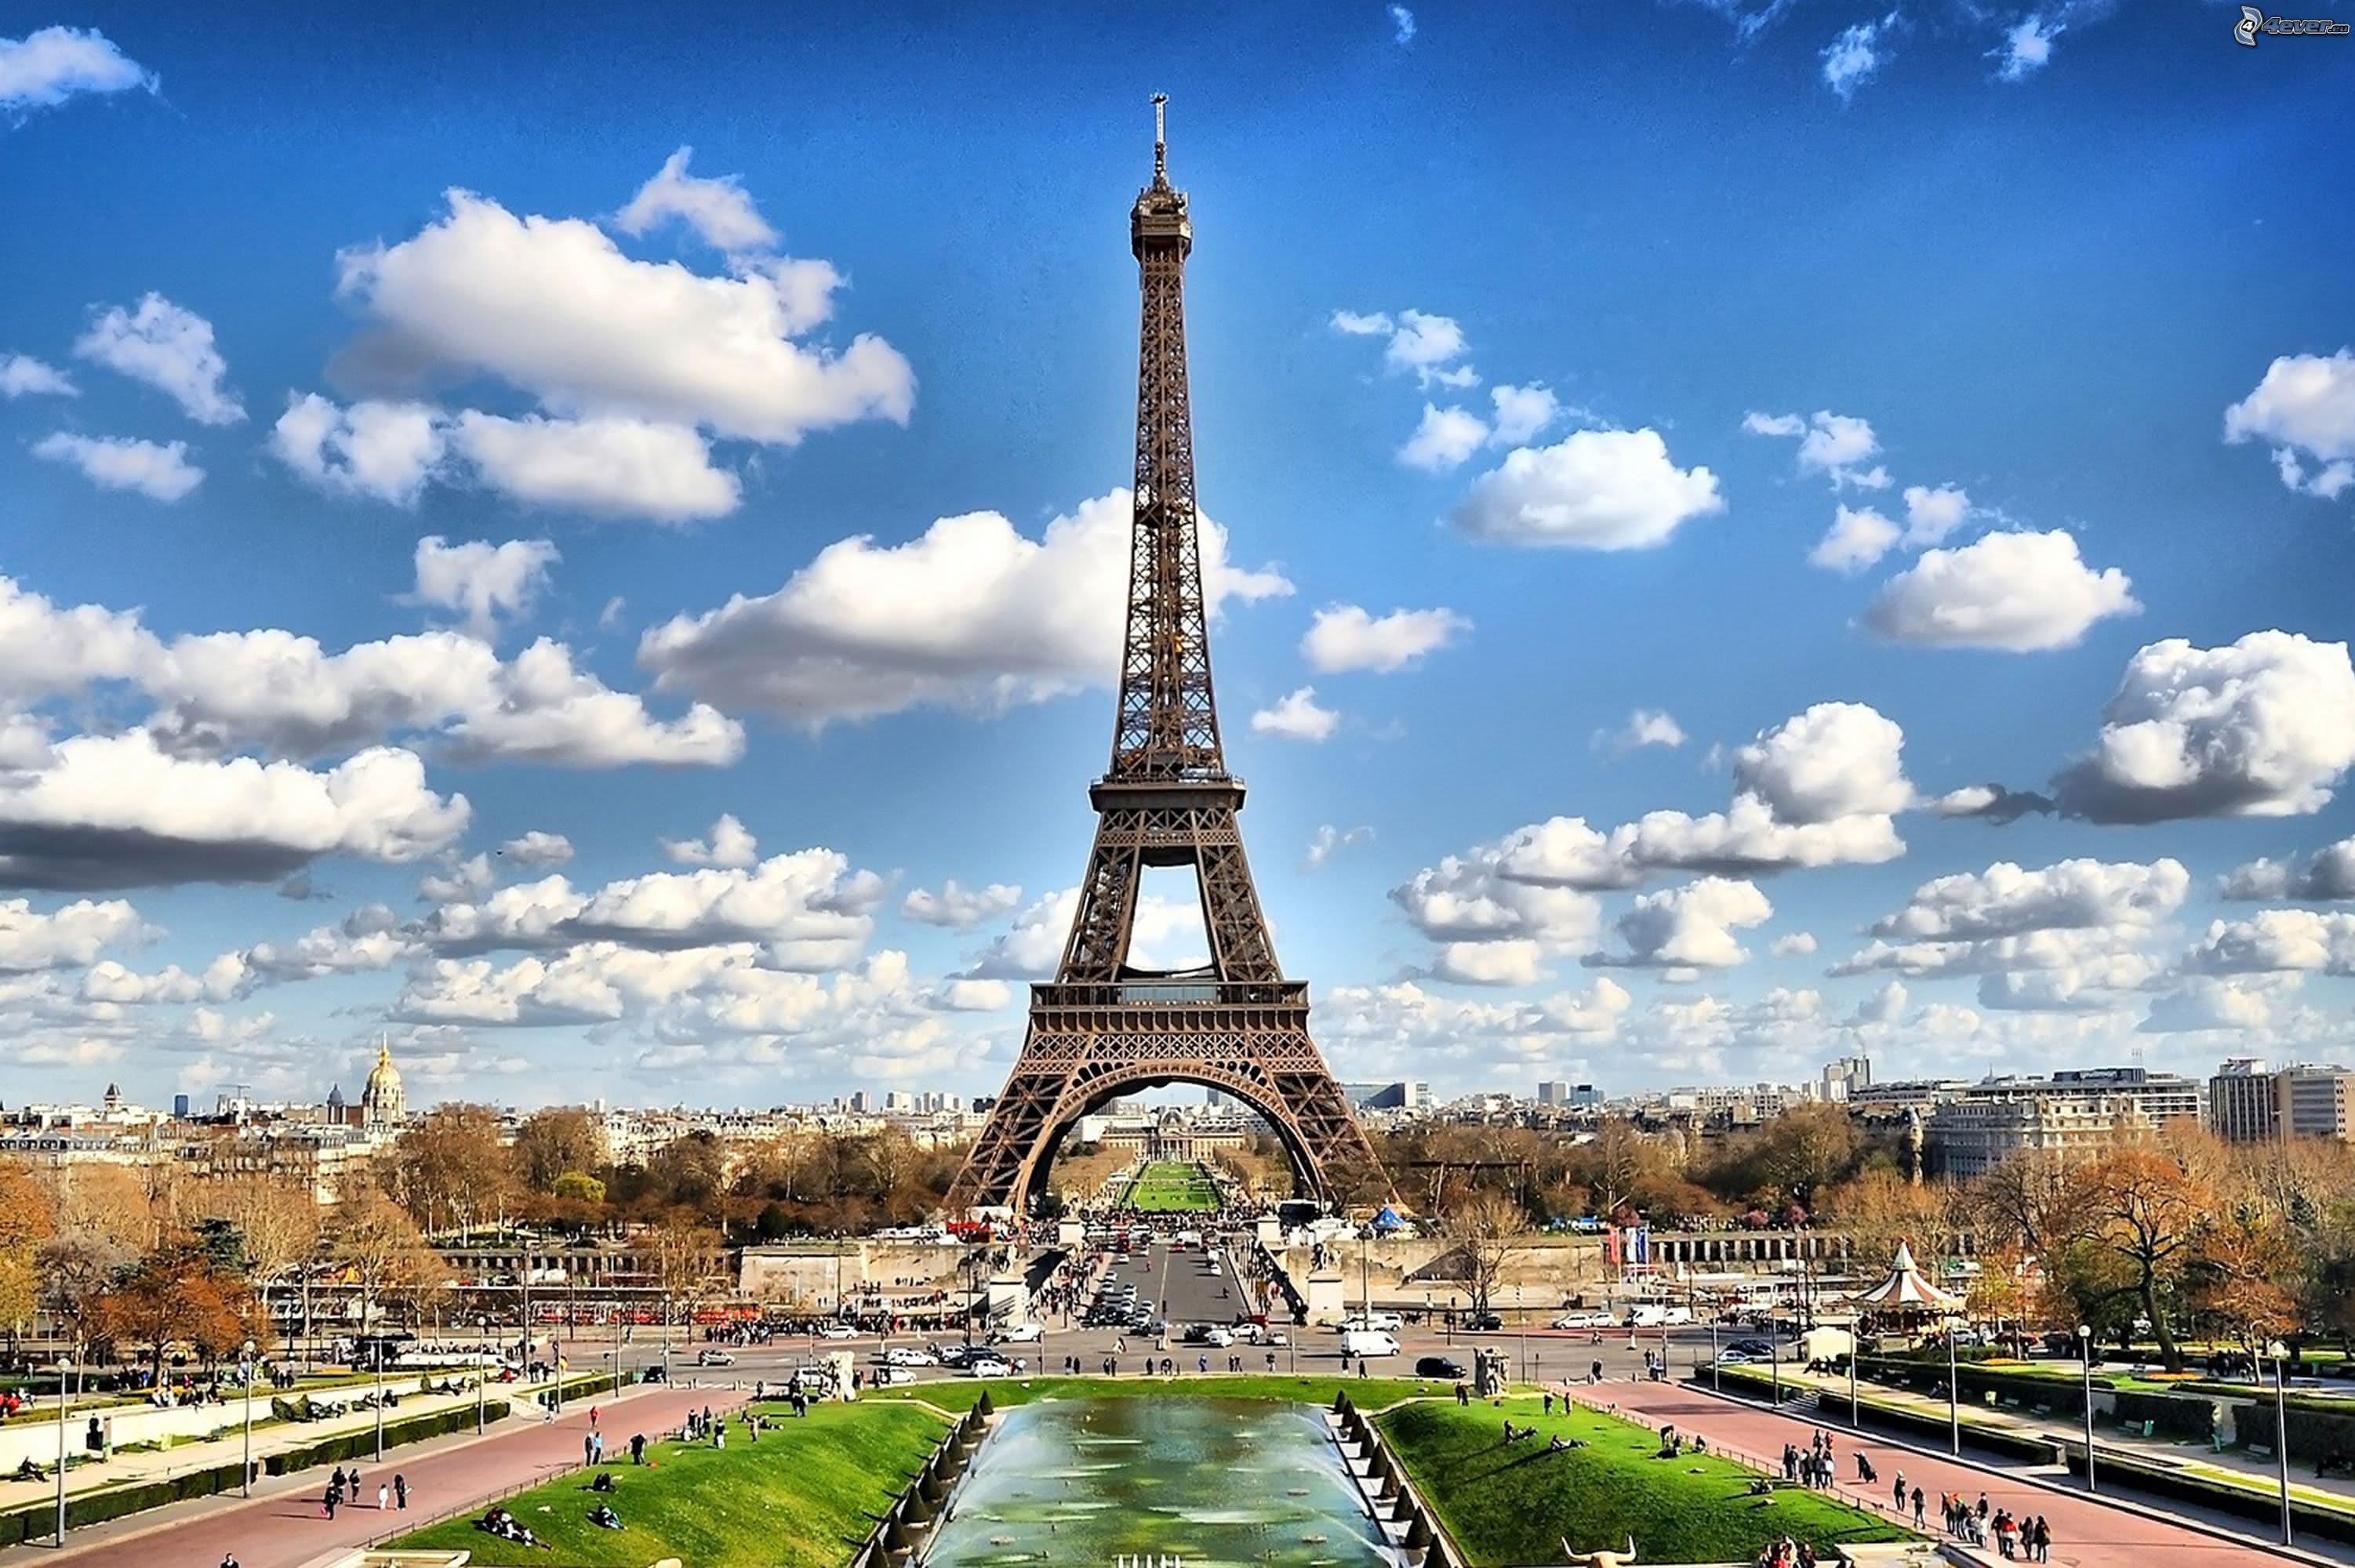 Alquiler de coches en Paris Orly Aeropuerto Oeste